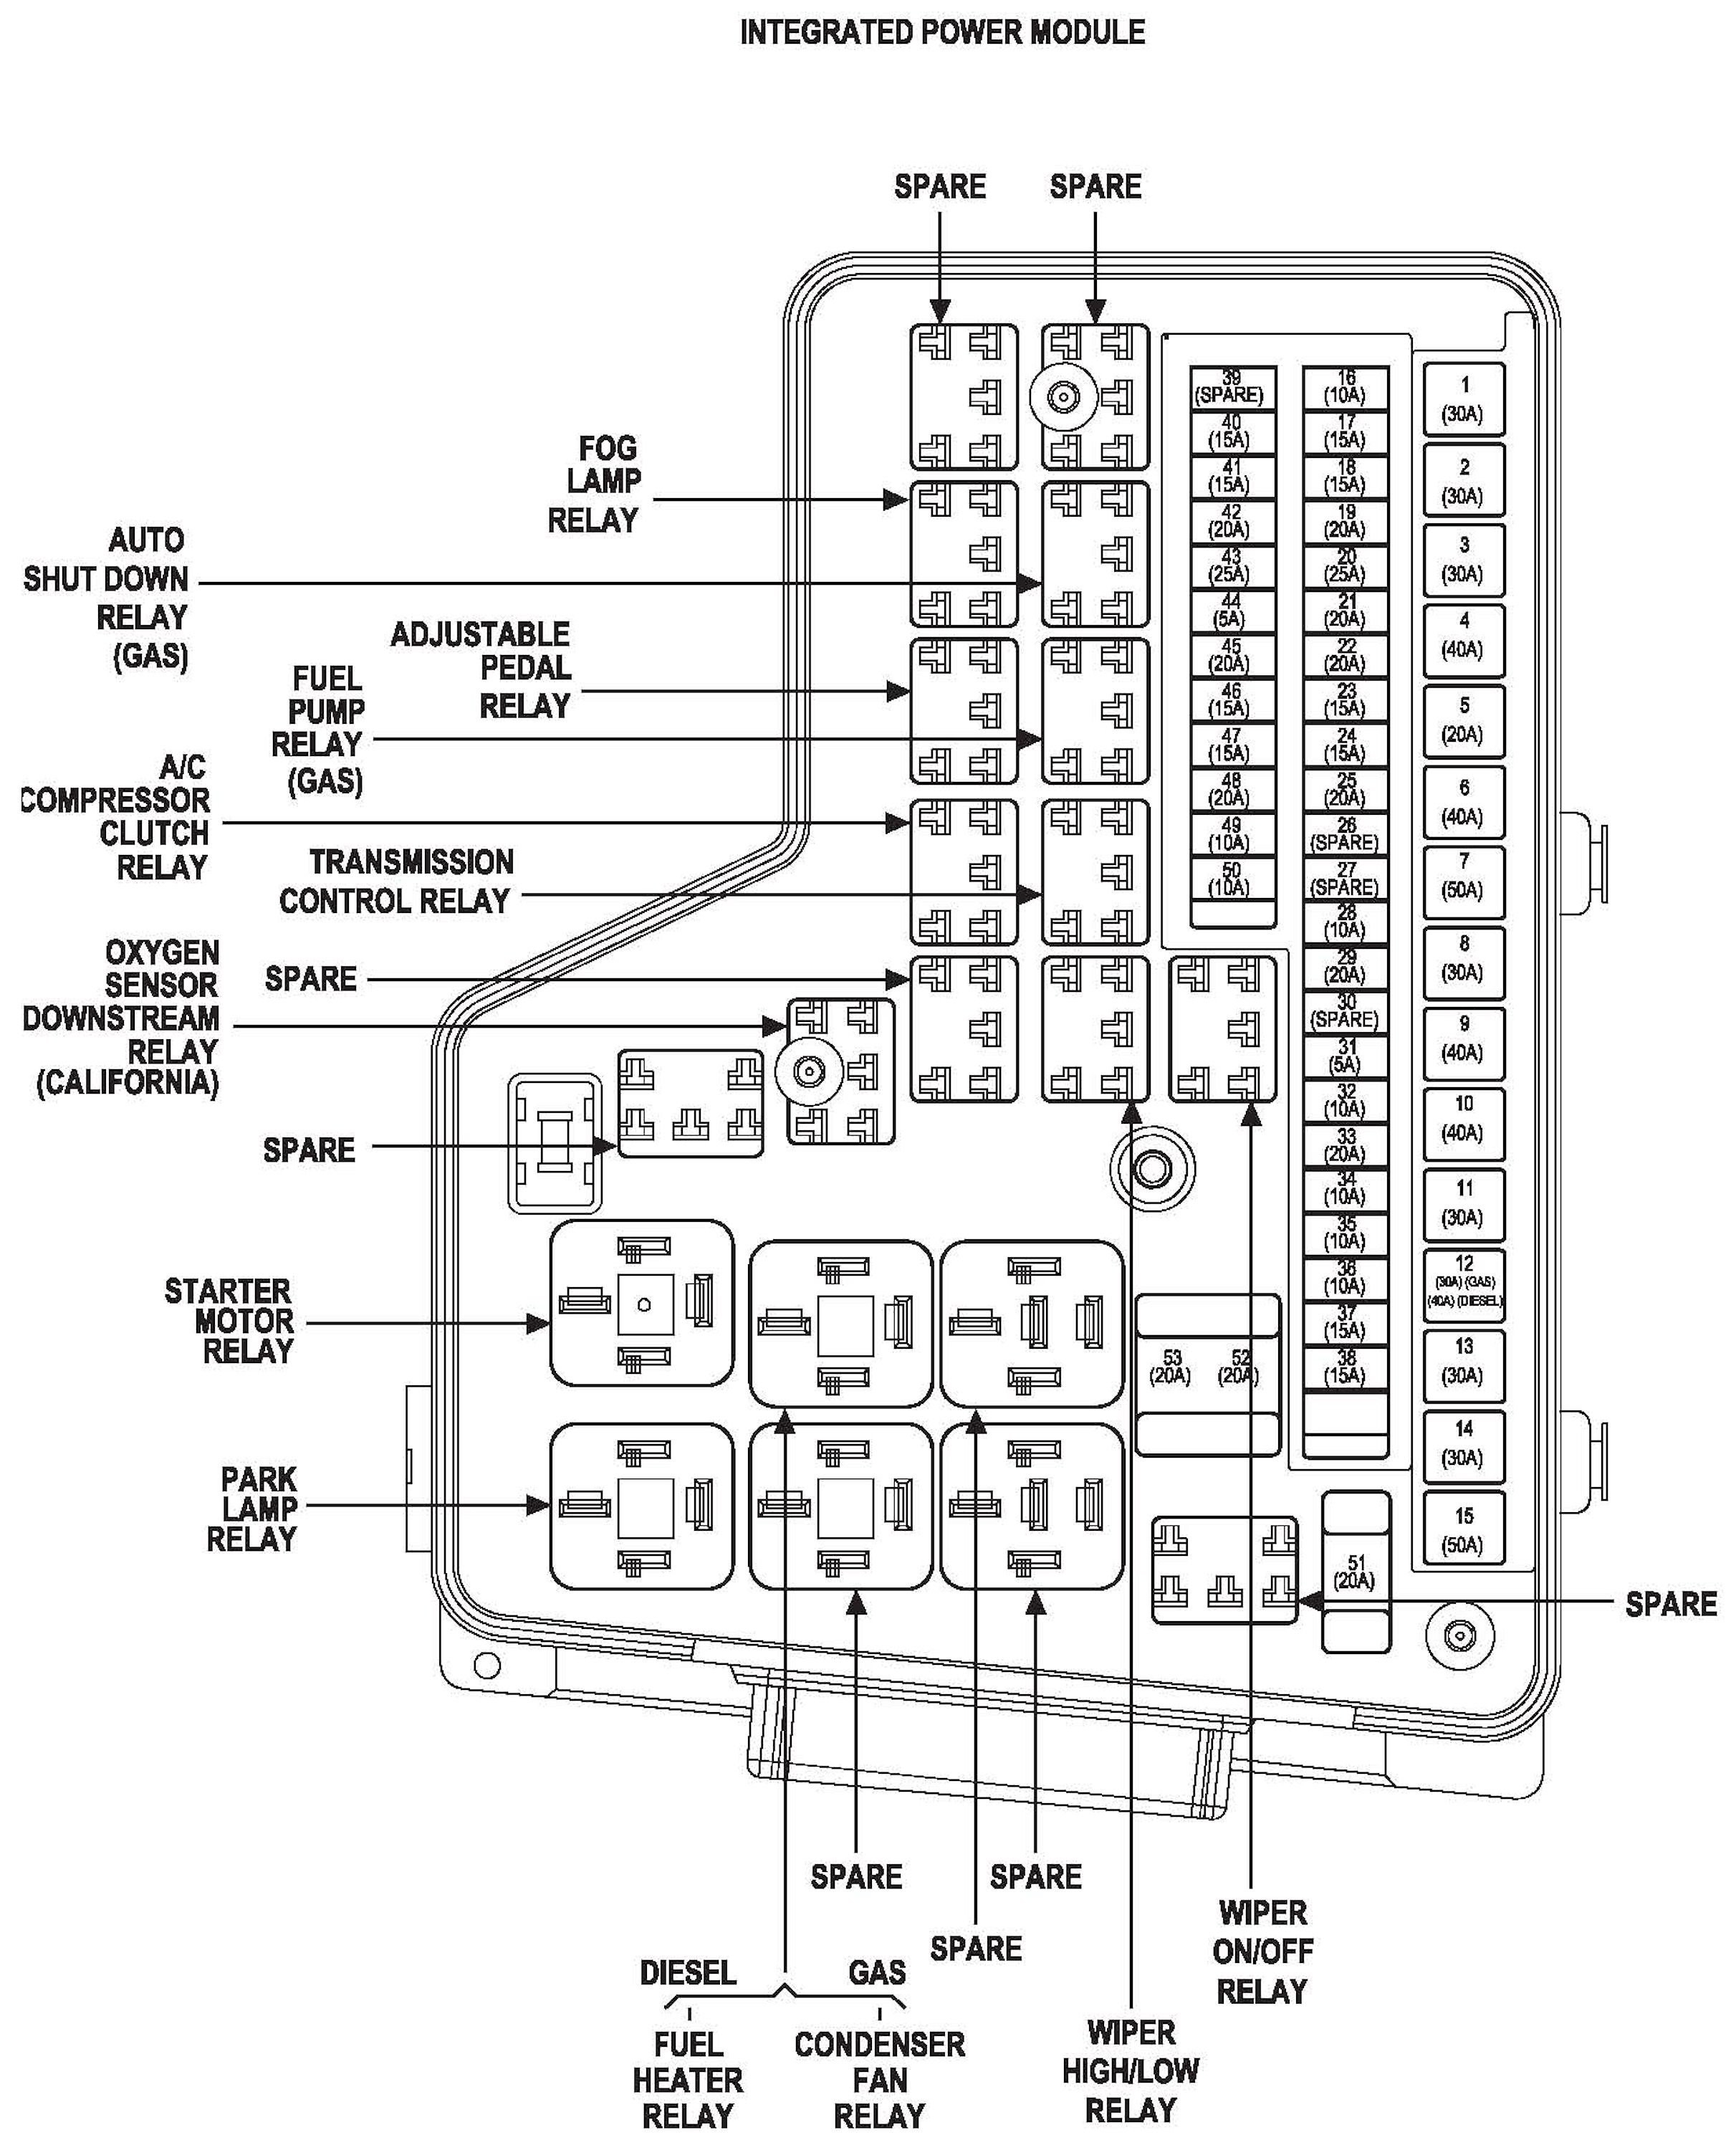 Ram Fuse Box   Wiring Diagram - 2004 Dodge Ram 1500 Wiring Diagram